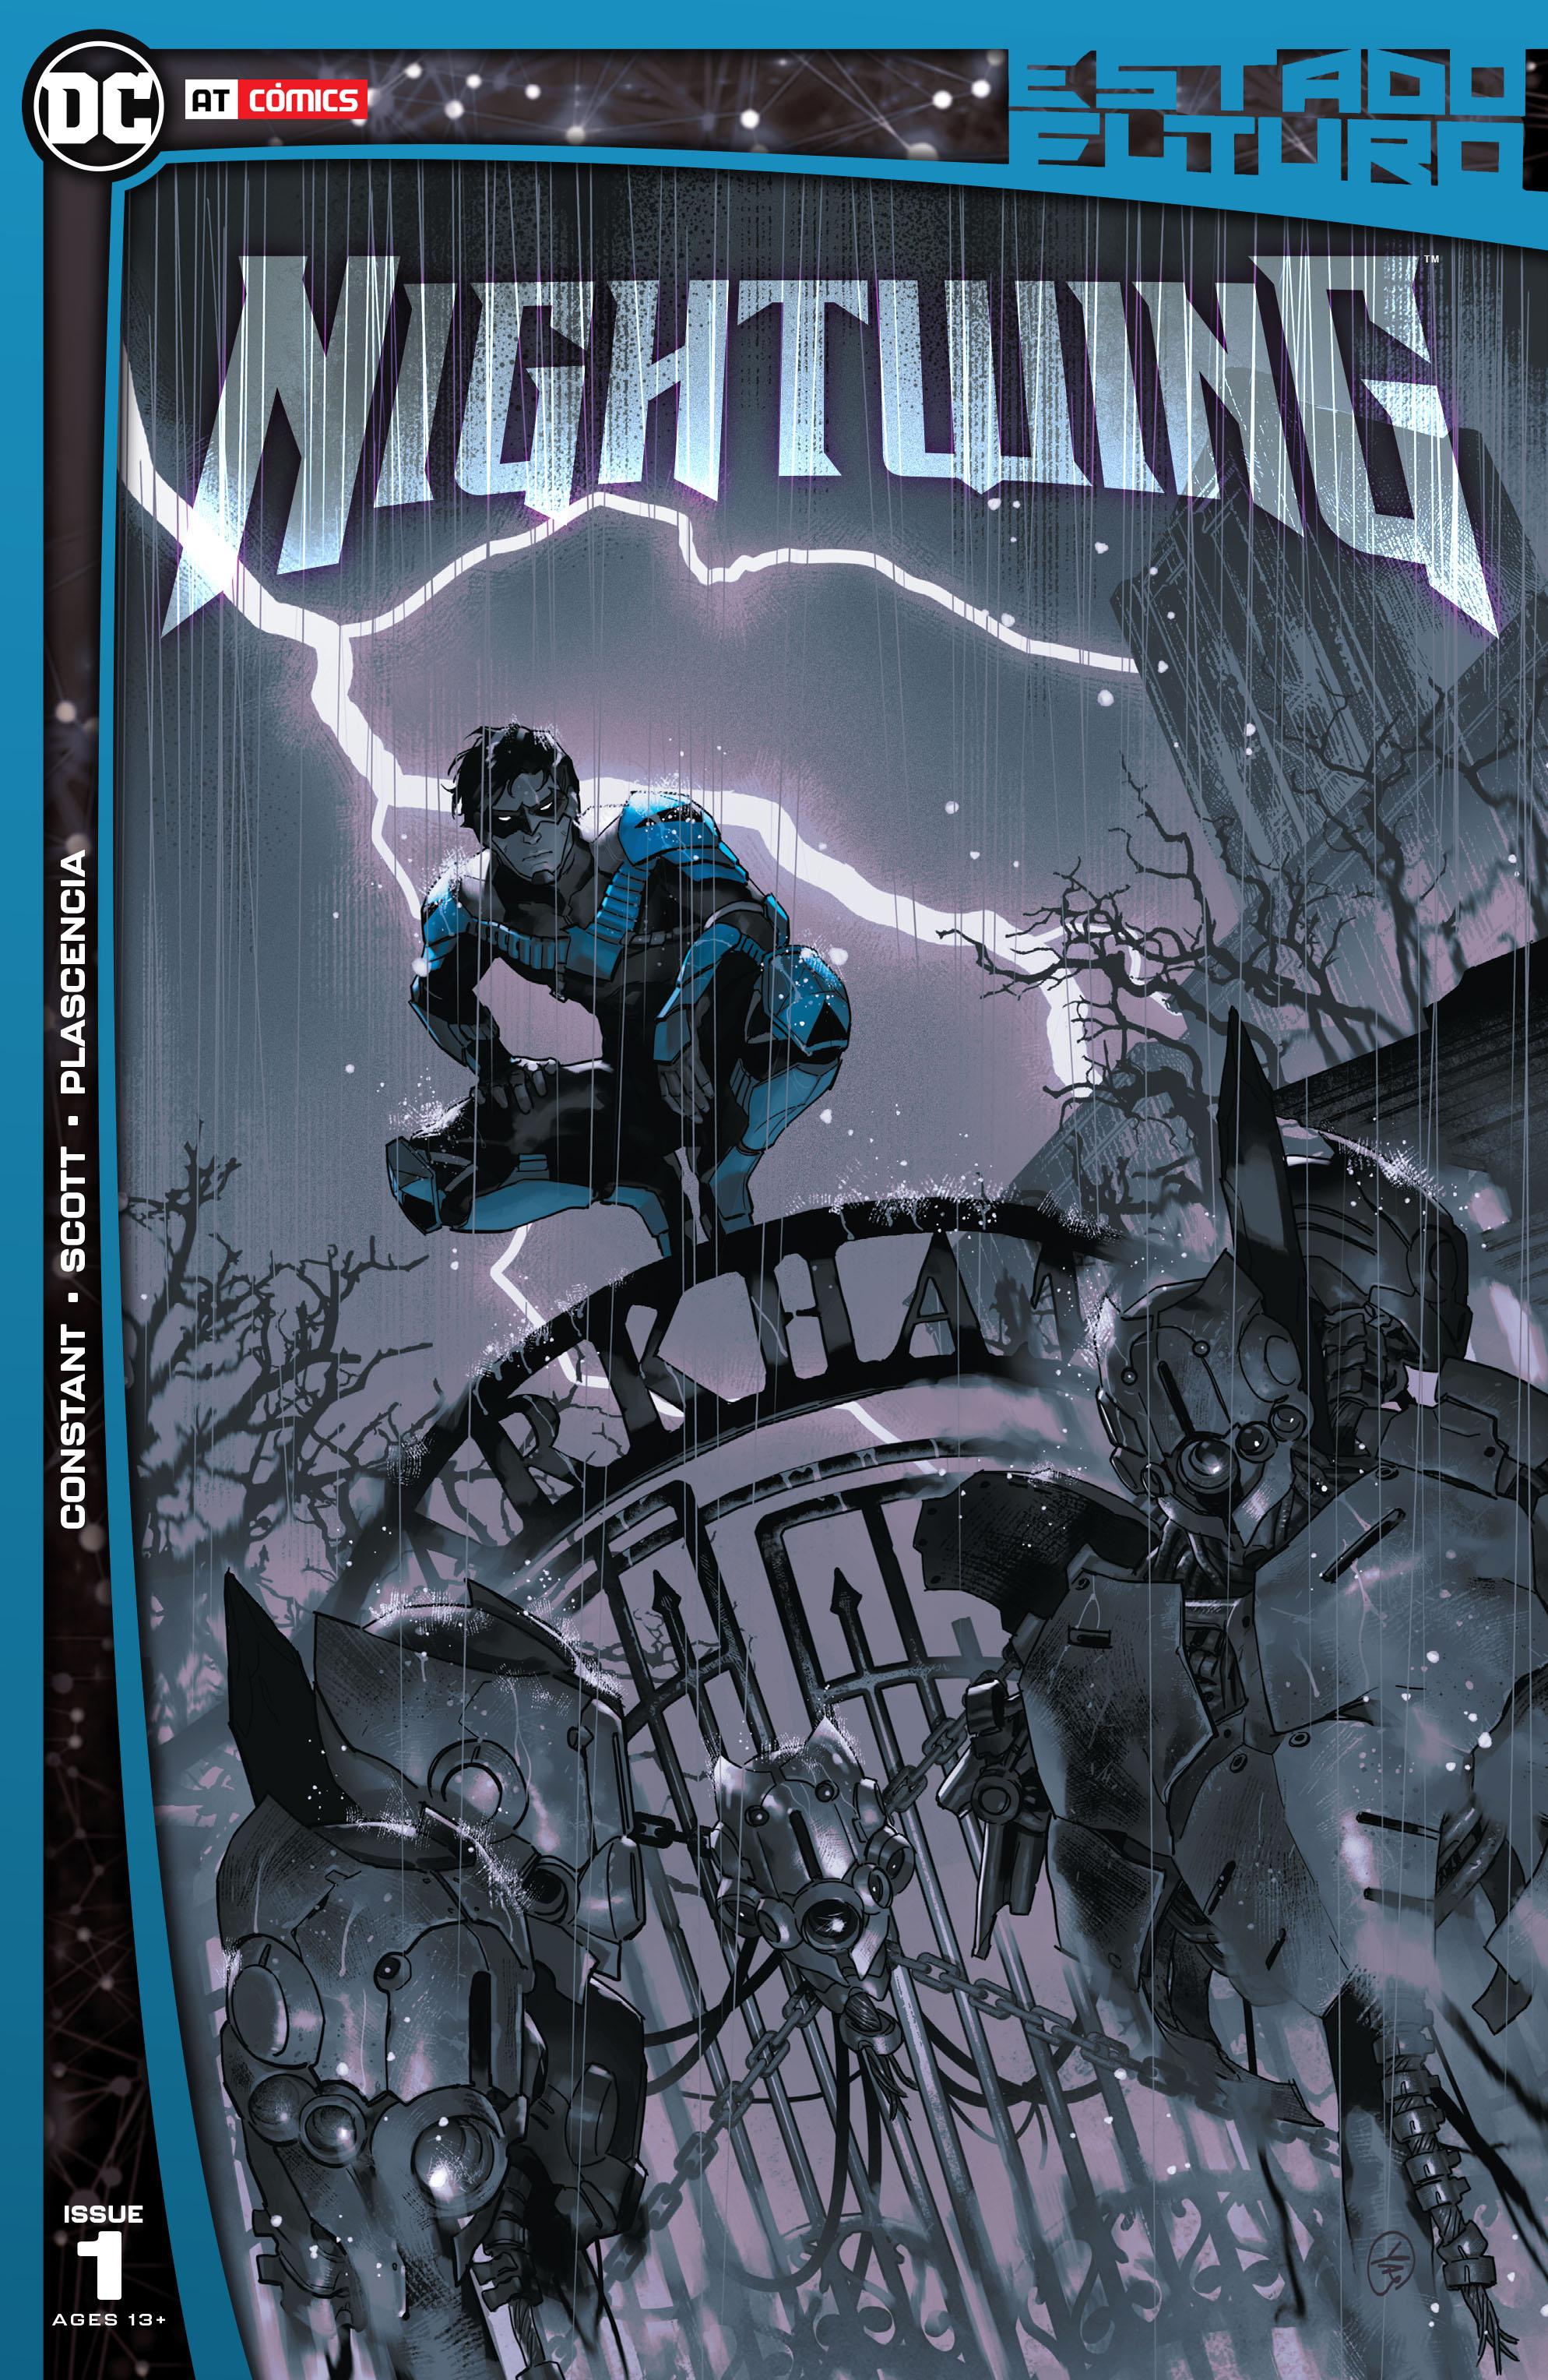 Estado Futuro - Nightwing